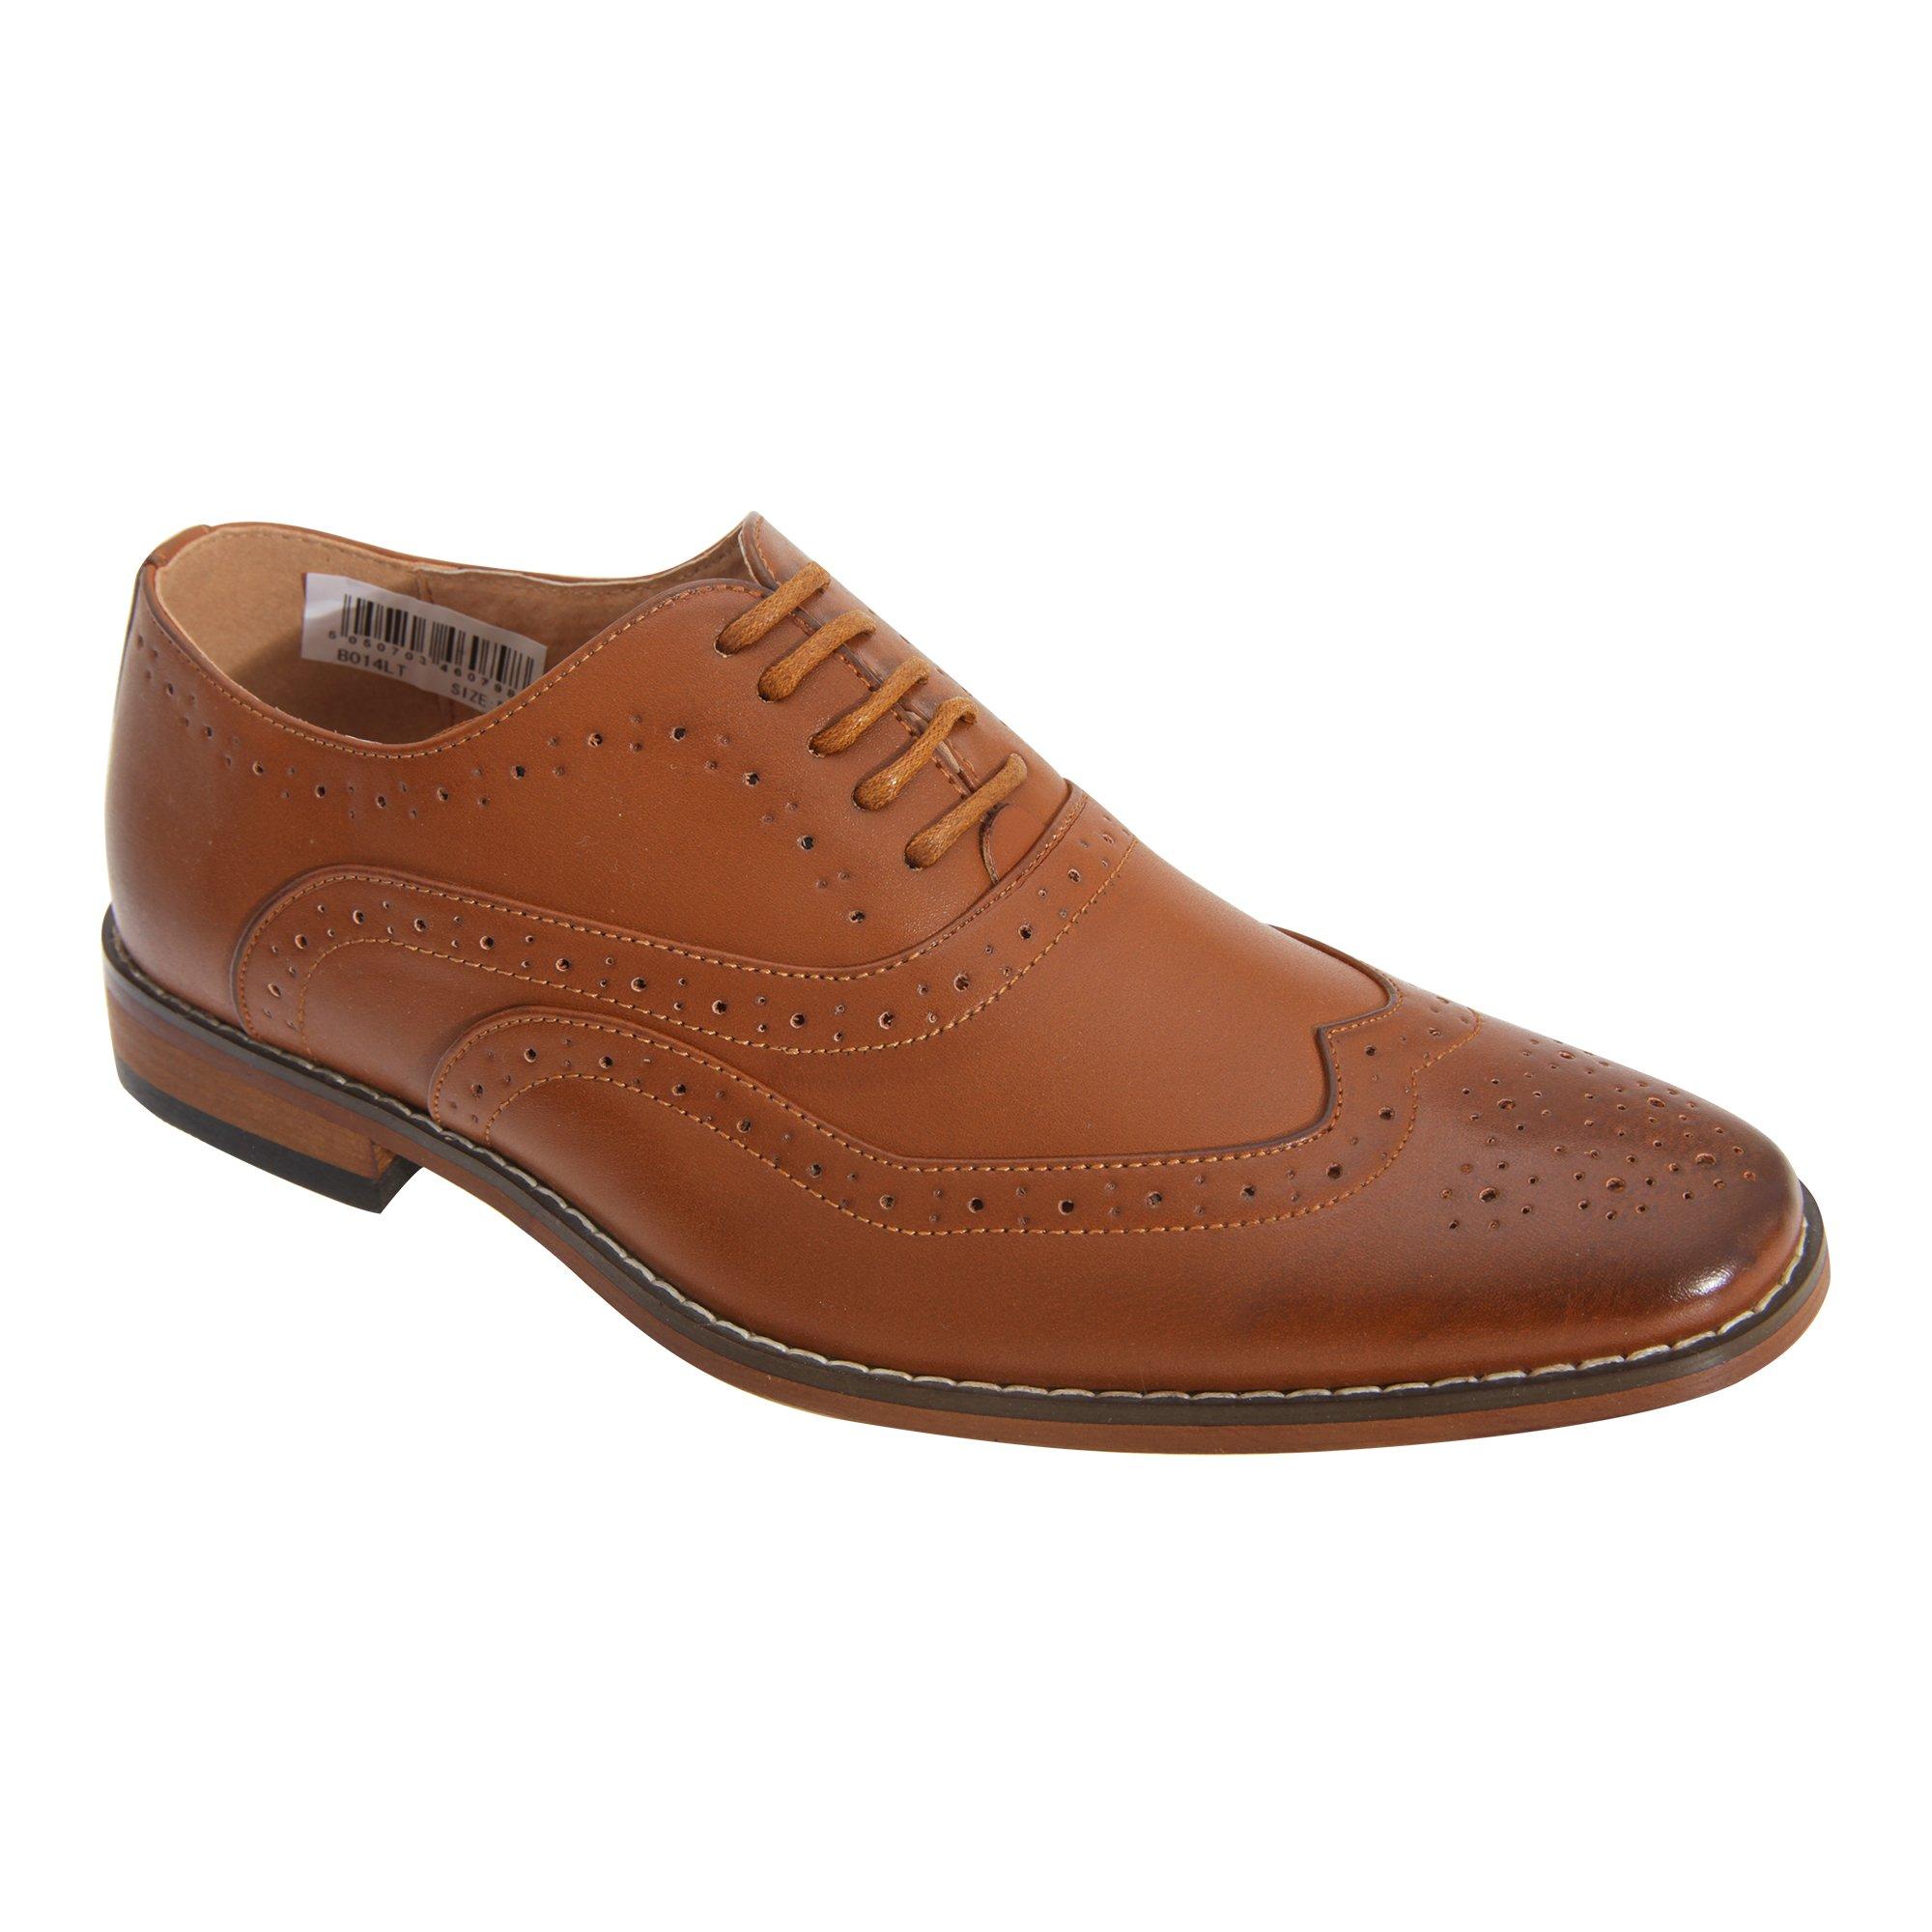 Goor Boys 5 Eyelet Brogue Oxford Shoes (5 Youth US) (Tan)